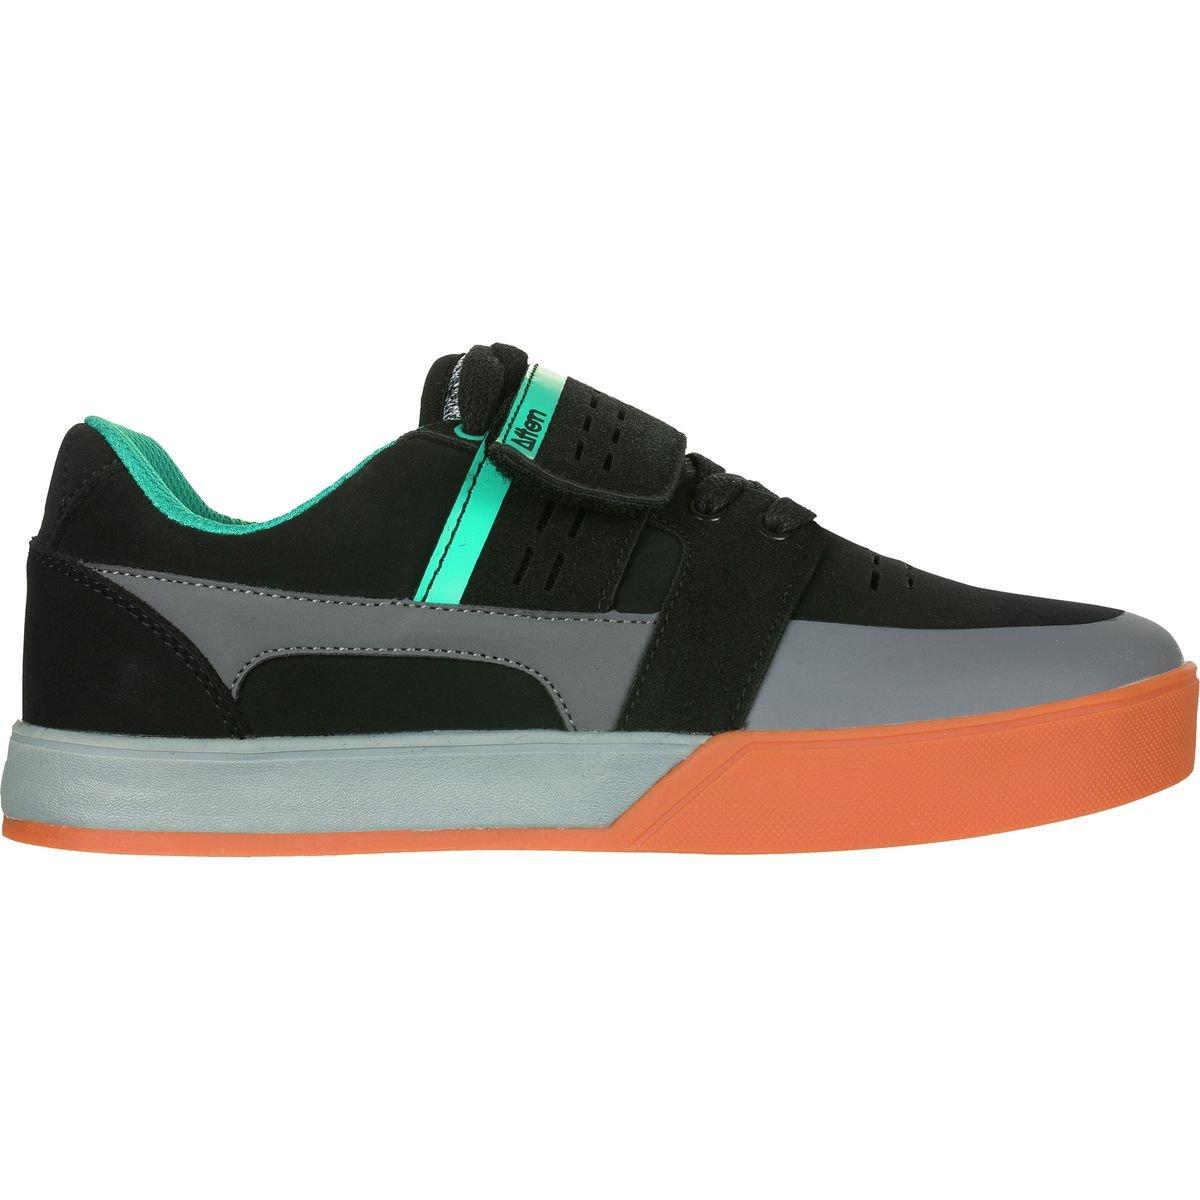 Afton Vectal Shoe – Men 'sブラック/ Turqoise、9.0   B077MRBW7B